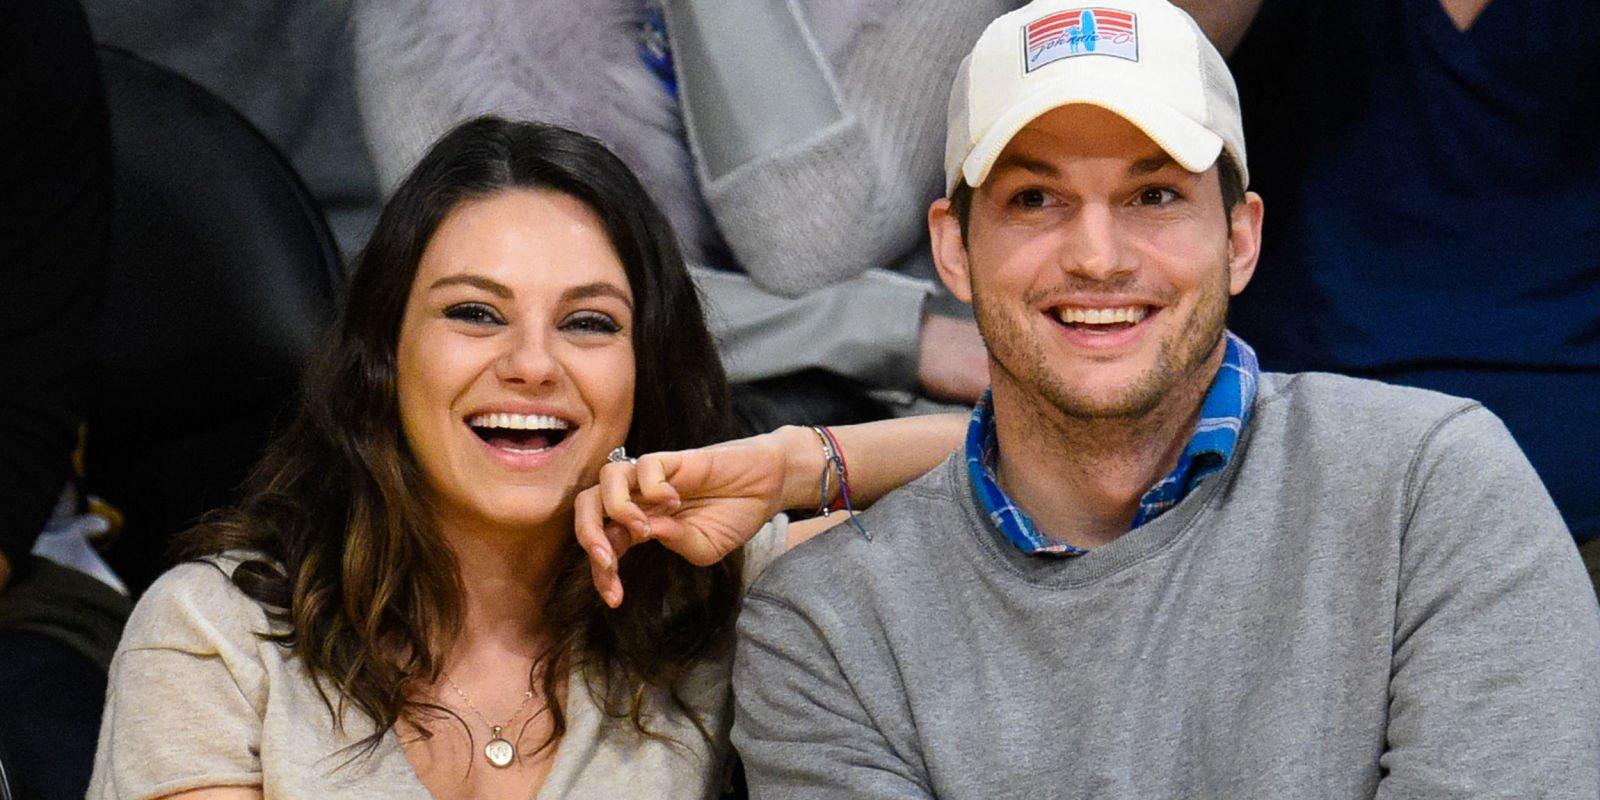 Apparently Ashton Kutcher tried to set Mila Kunis up with his friend originally https://t.co/nOcKpp9oyp https://t.co/m6EnvckdcO